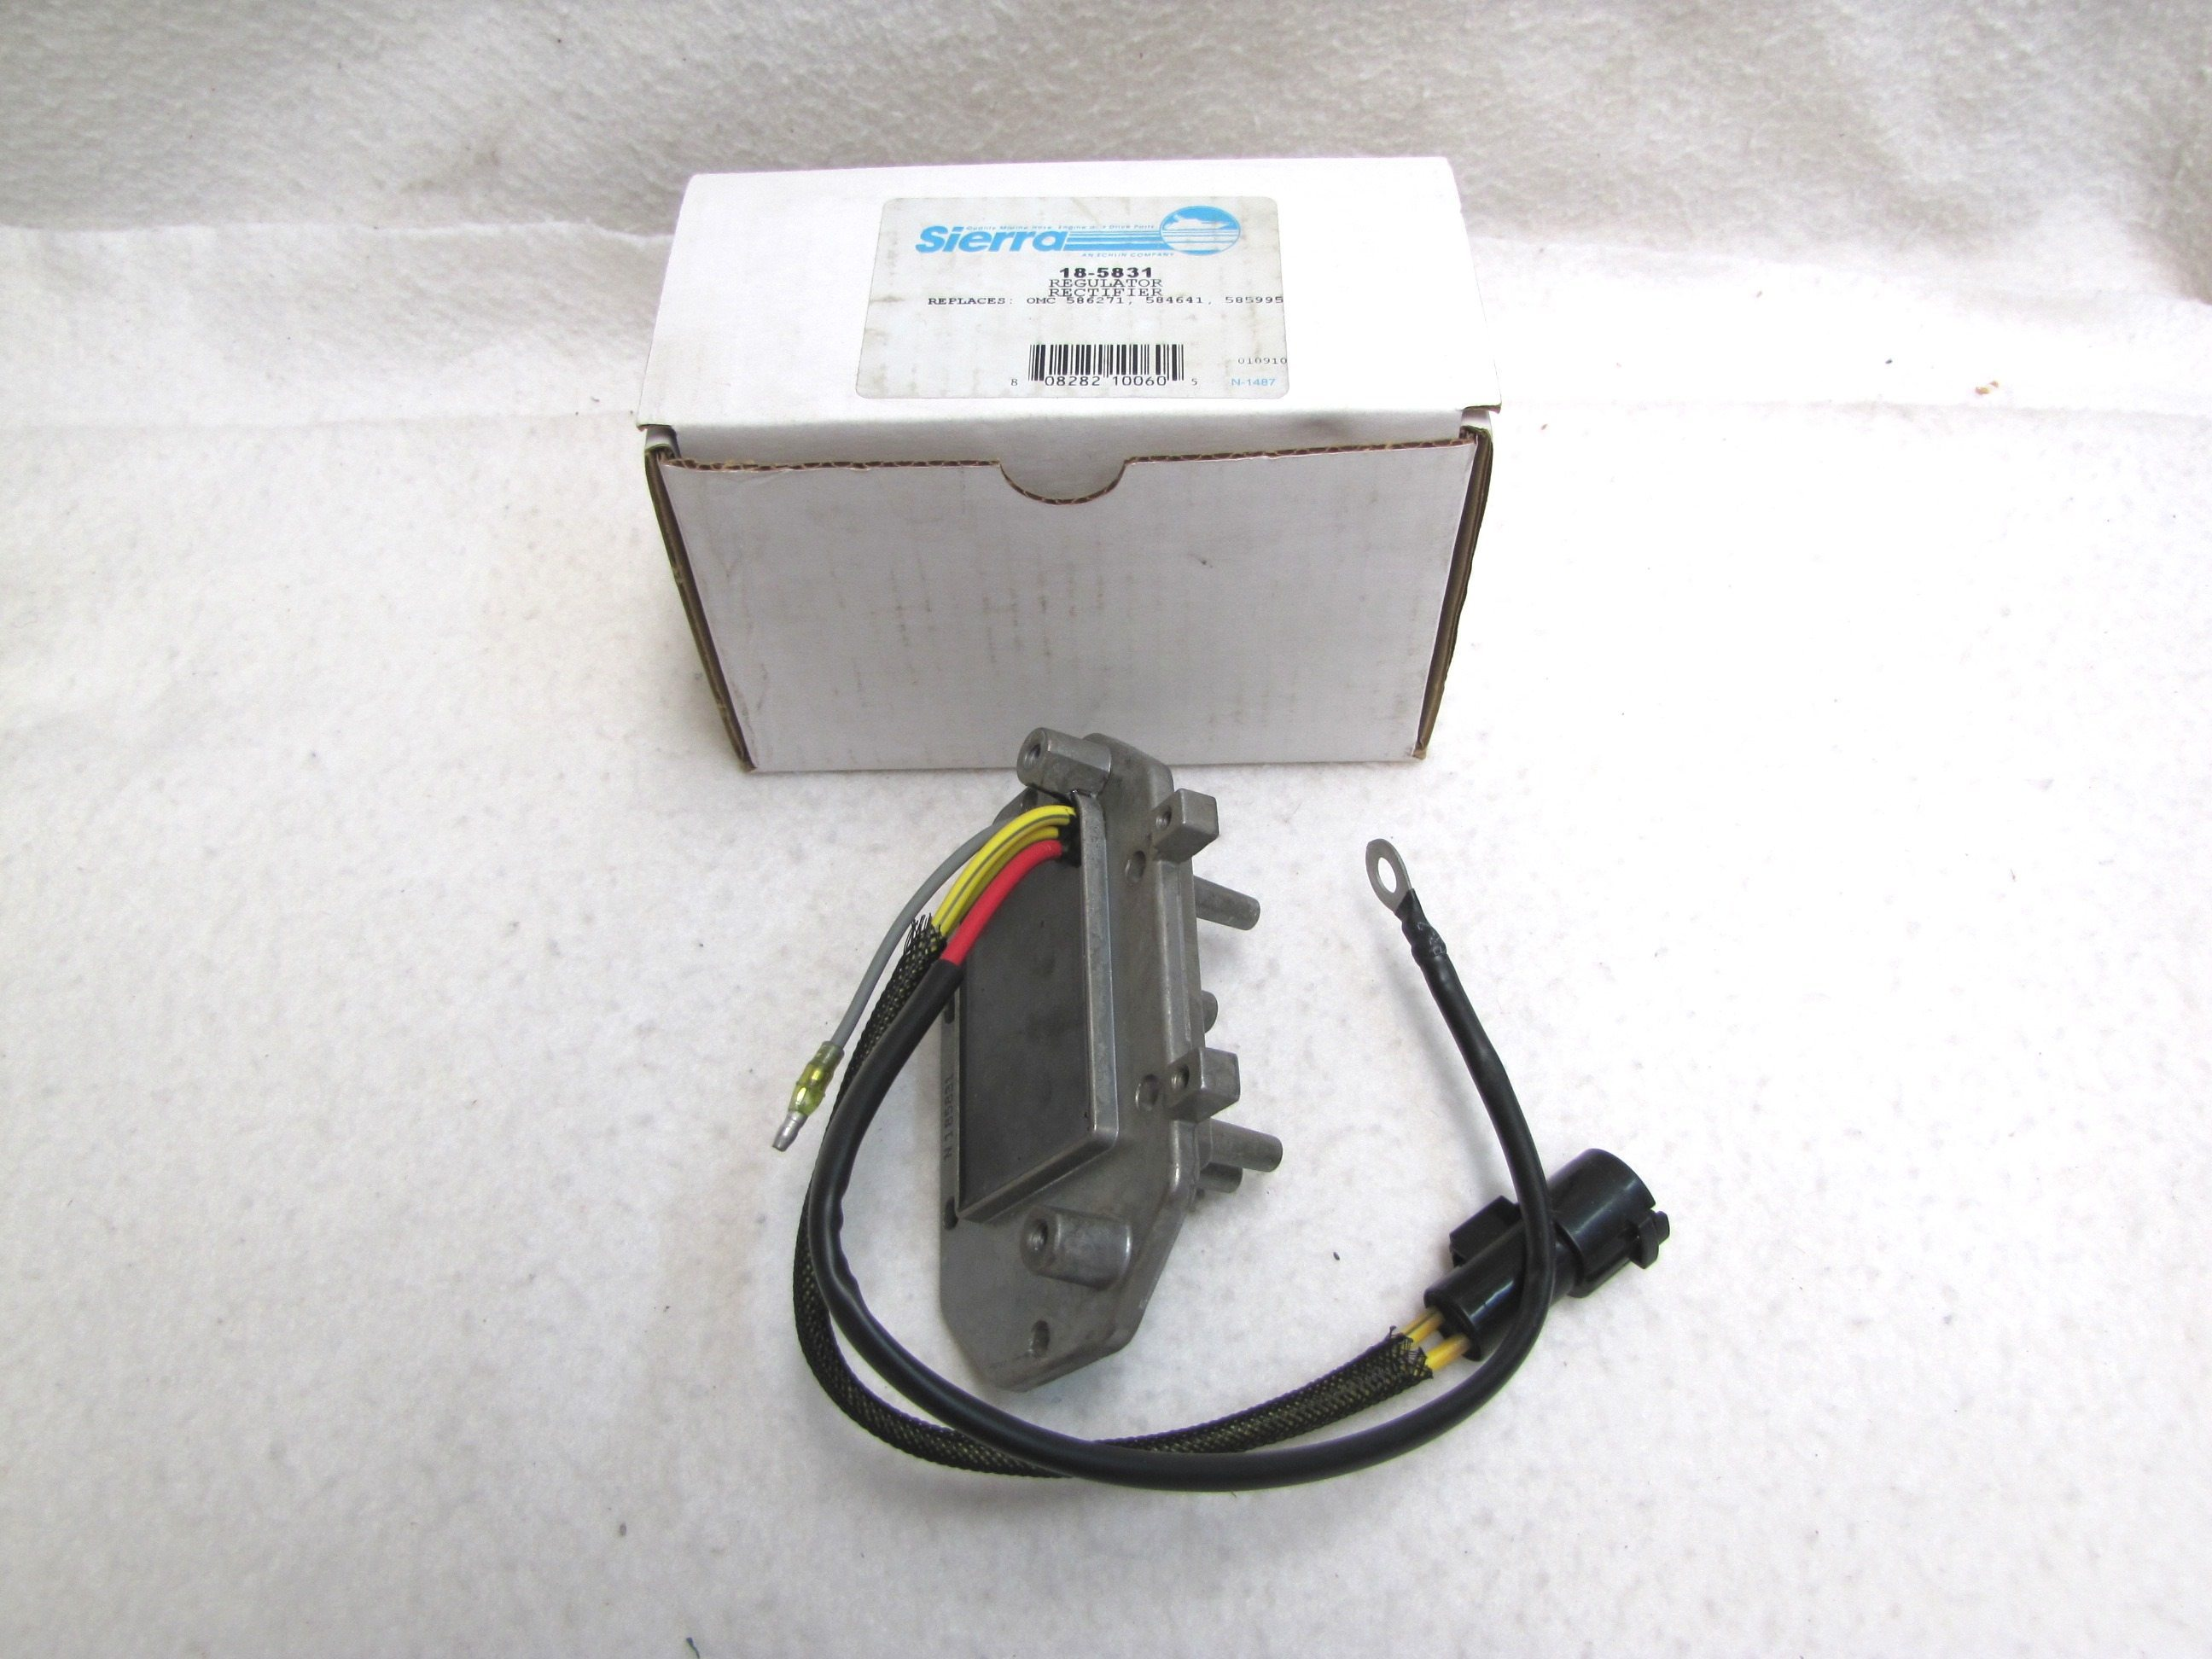 Other In-Car Technology Sierra  Voltage Regulator/Rectifier 18-5825 Vehicle Parts & Accessories